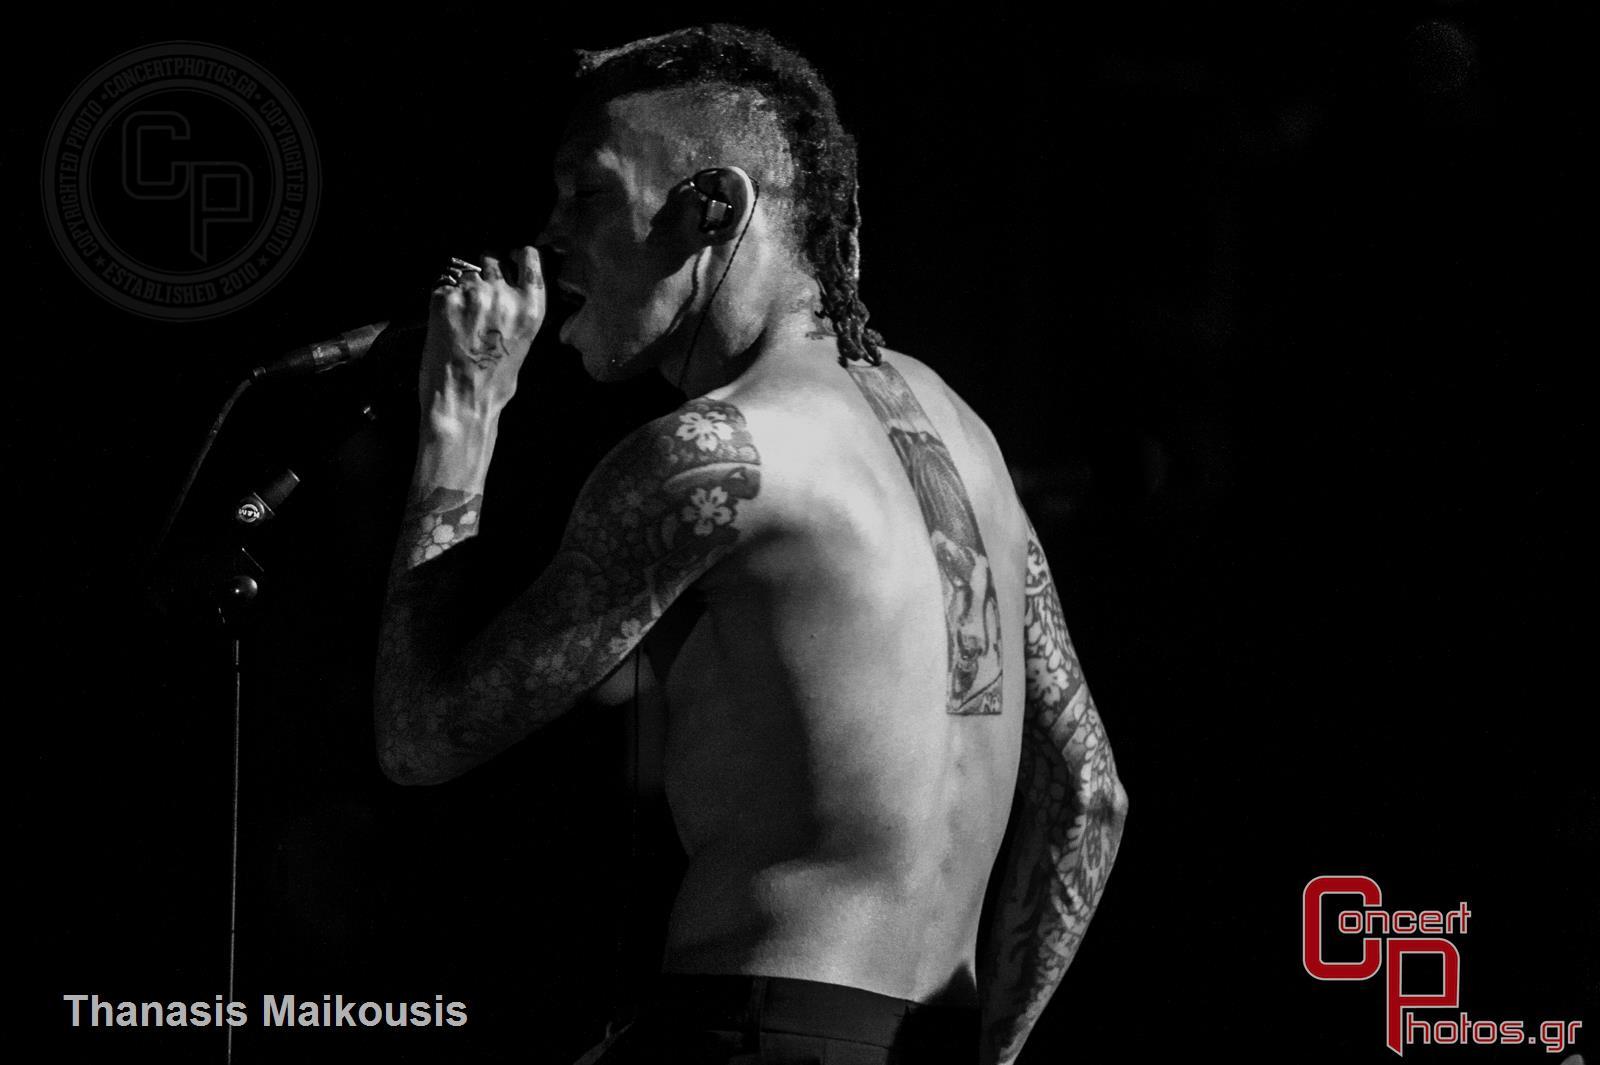 Tricky - Spectralfire-Tricky - Spectralfire photographer: Thanasis Maikousis - concertphotos_-3855